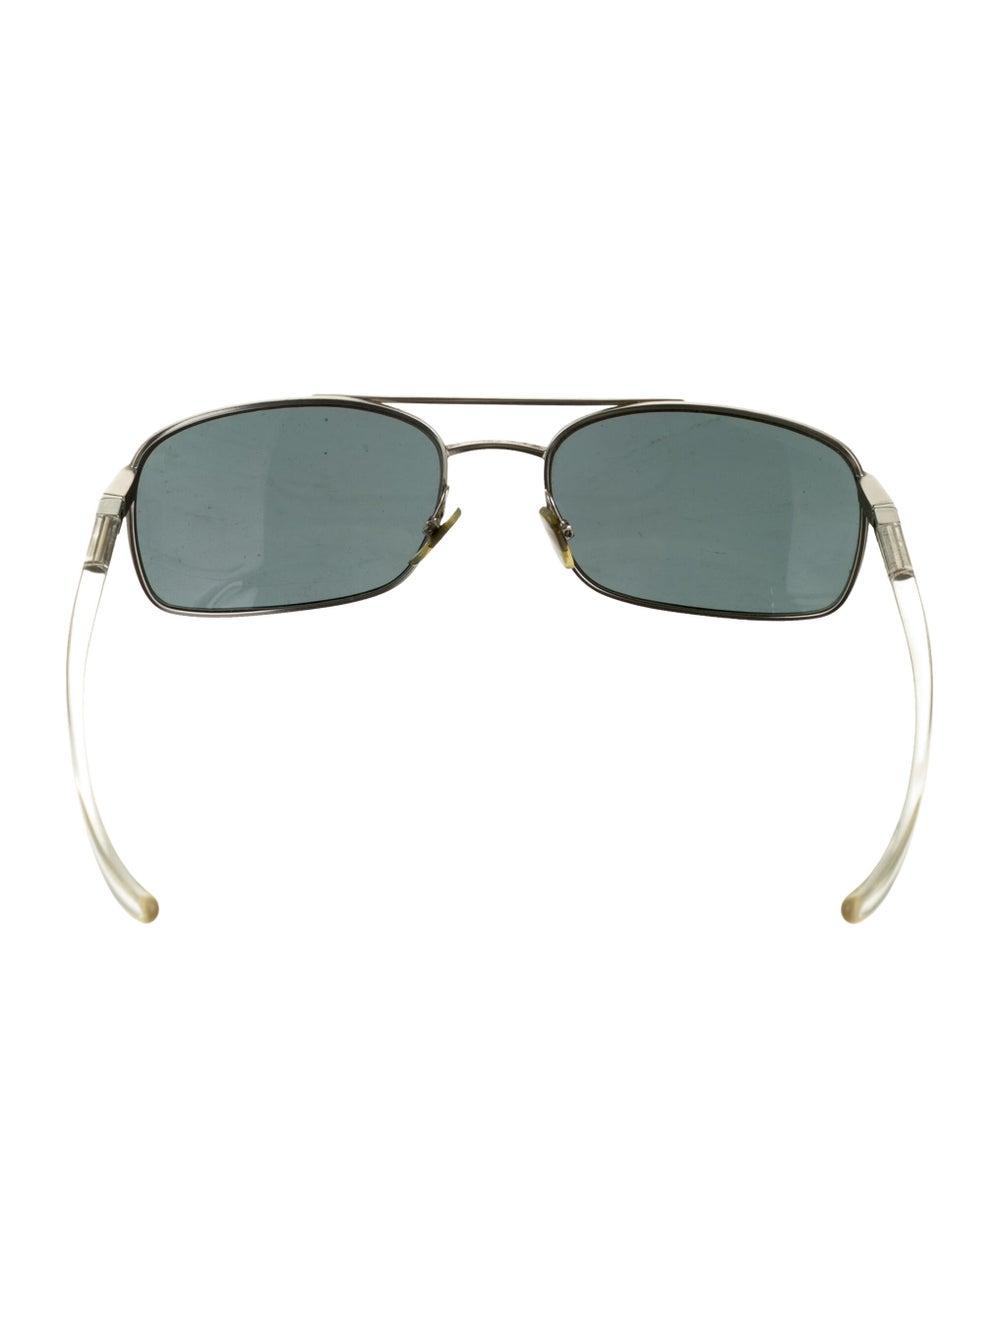 Alain Mikli Tinted Aviator Sunglasses silver - image 3